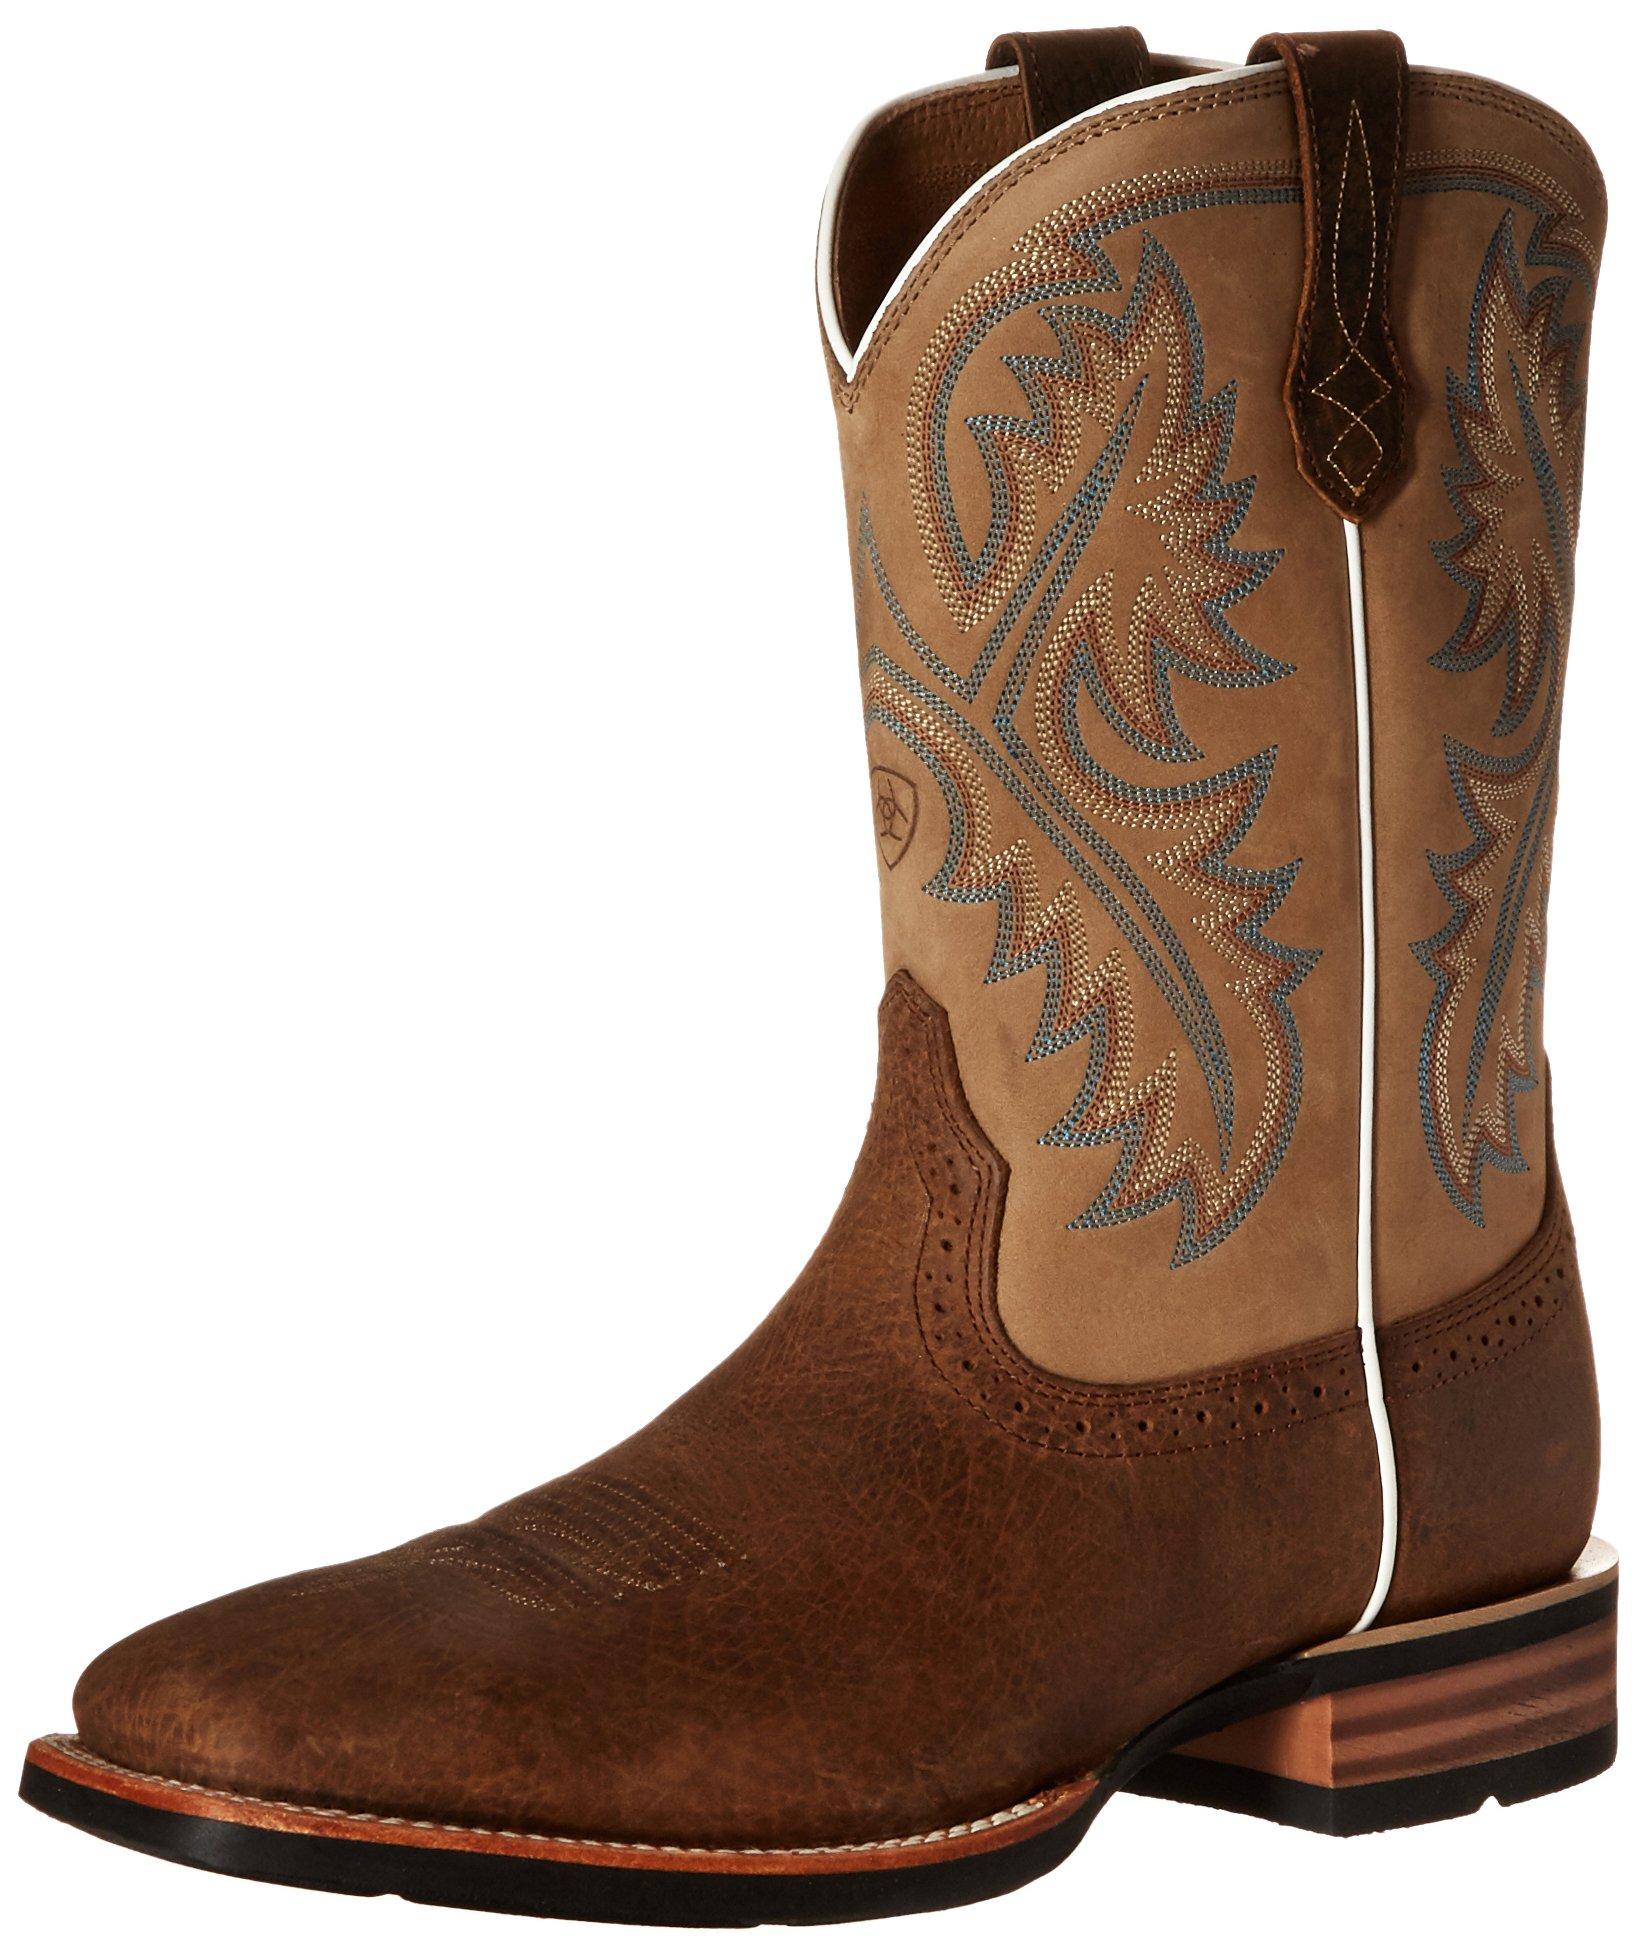 Ariat Men's Quickdraw Western Boot, Tumbled Bark/Beige, 10.5 D US